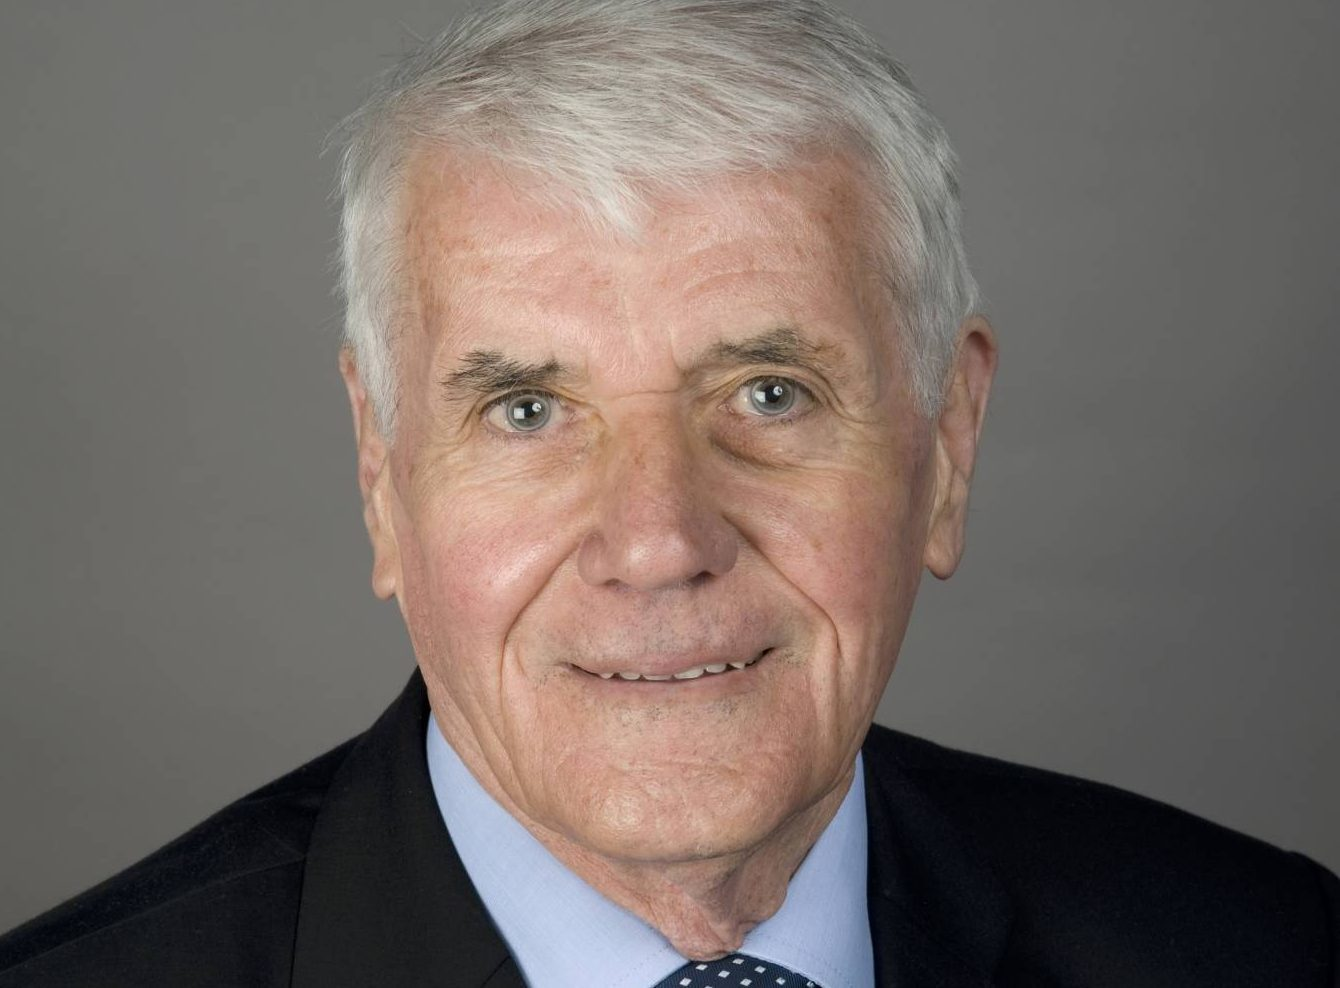 Councillor Ian Gray has passed away after a long illness.